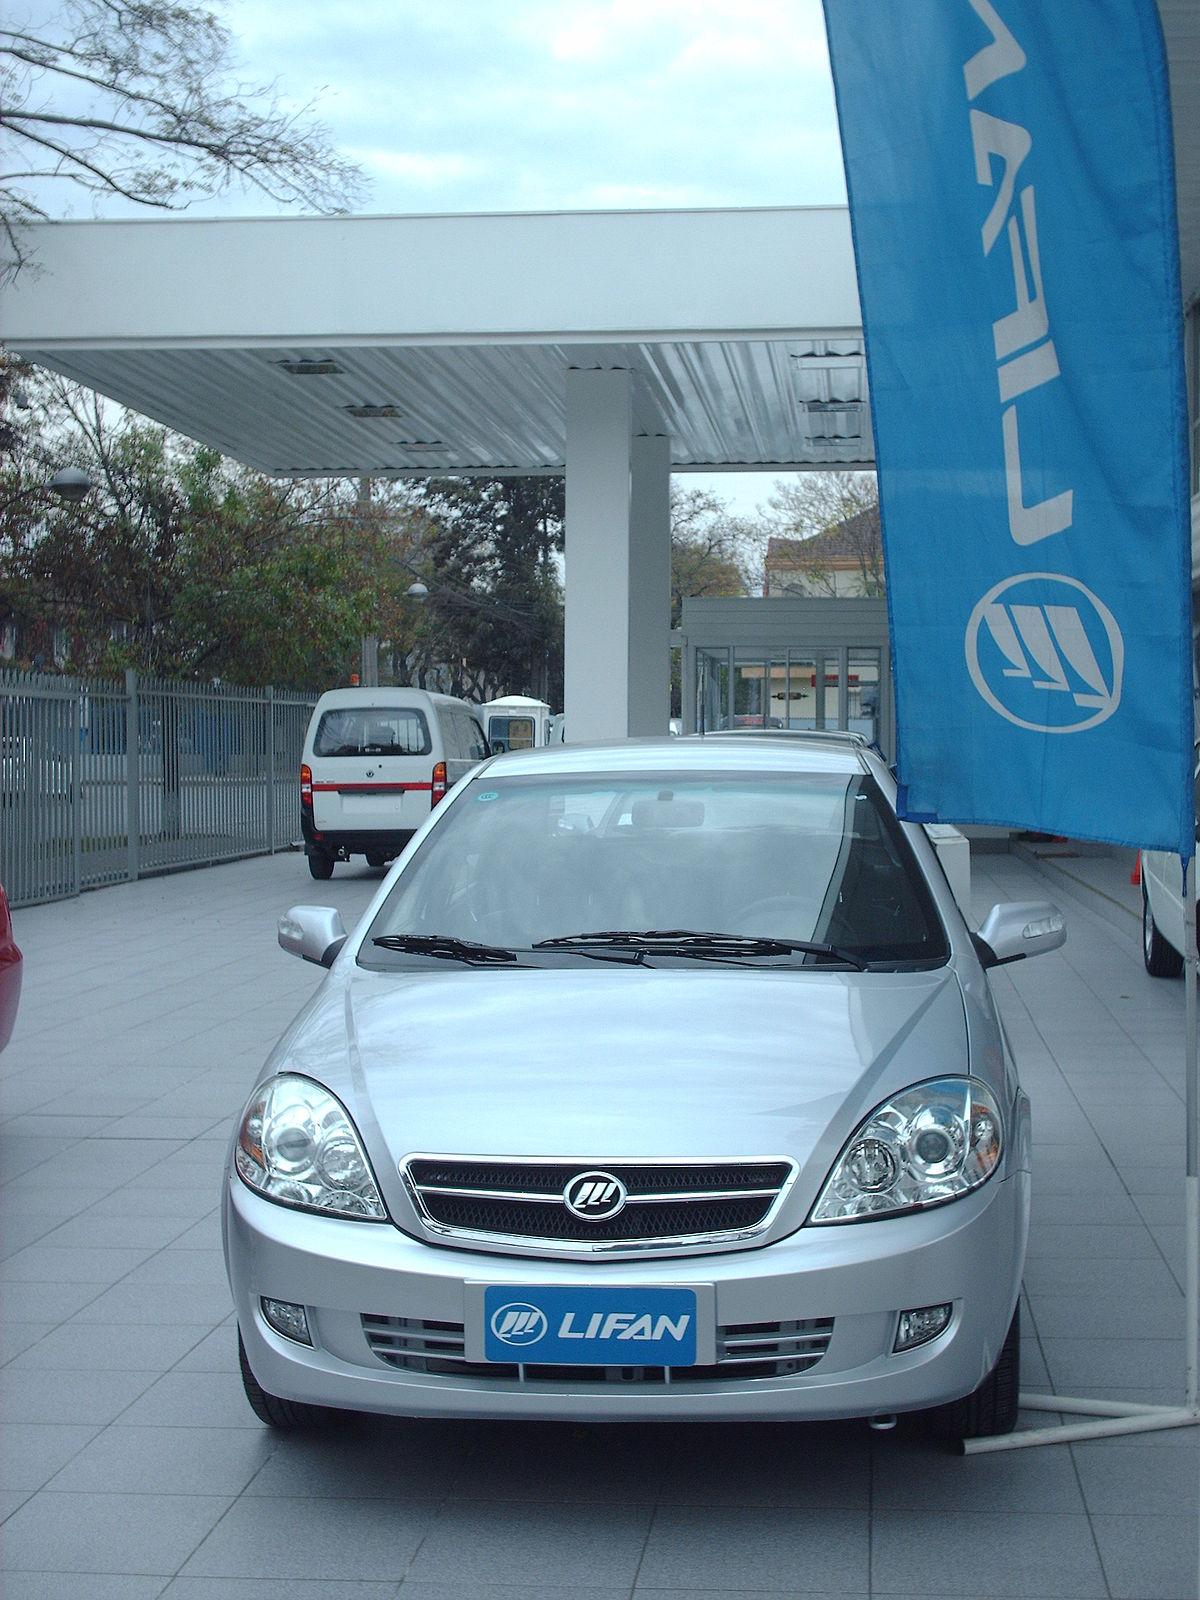 Lifan Automobile Wikip 233 Dia